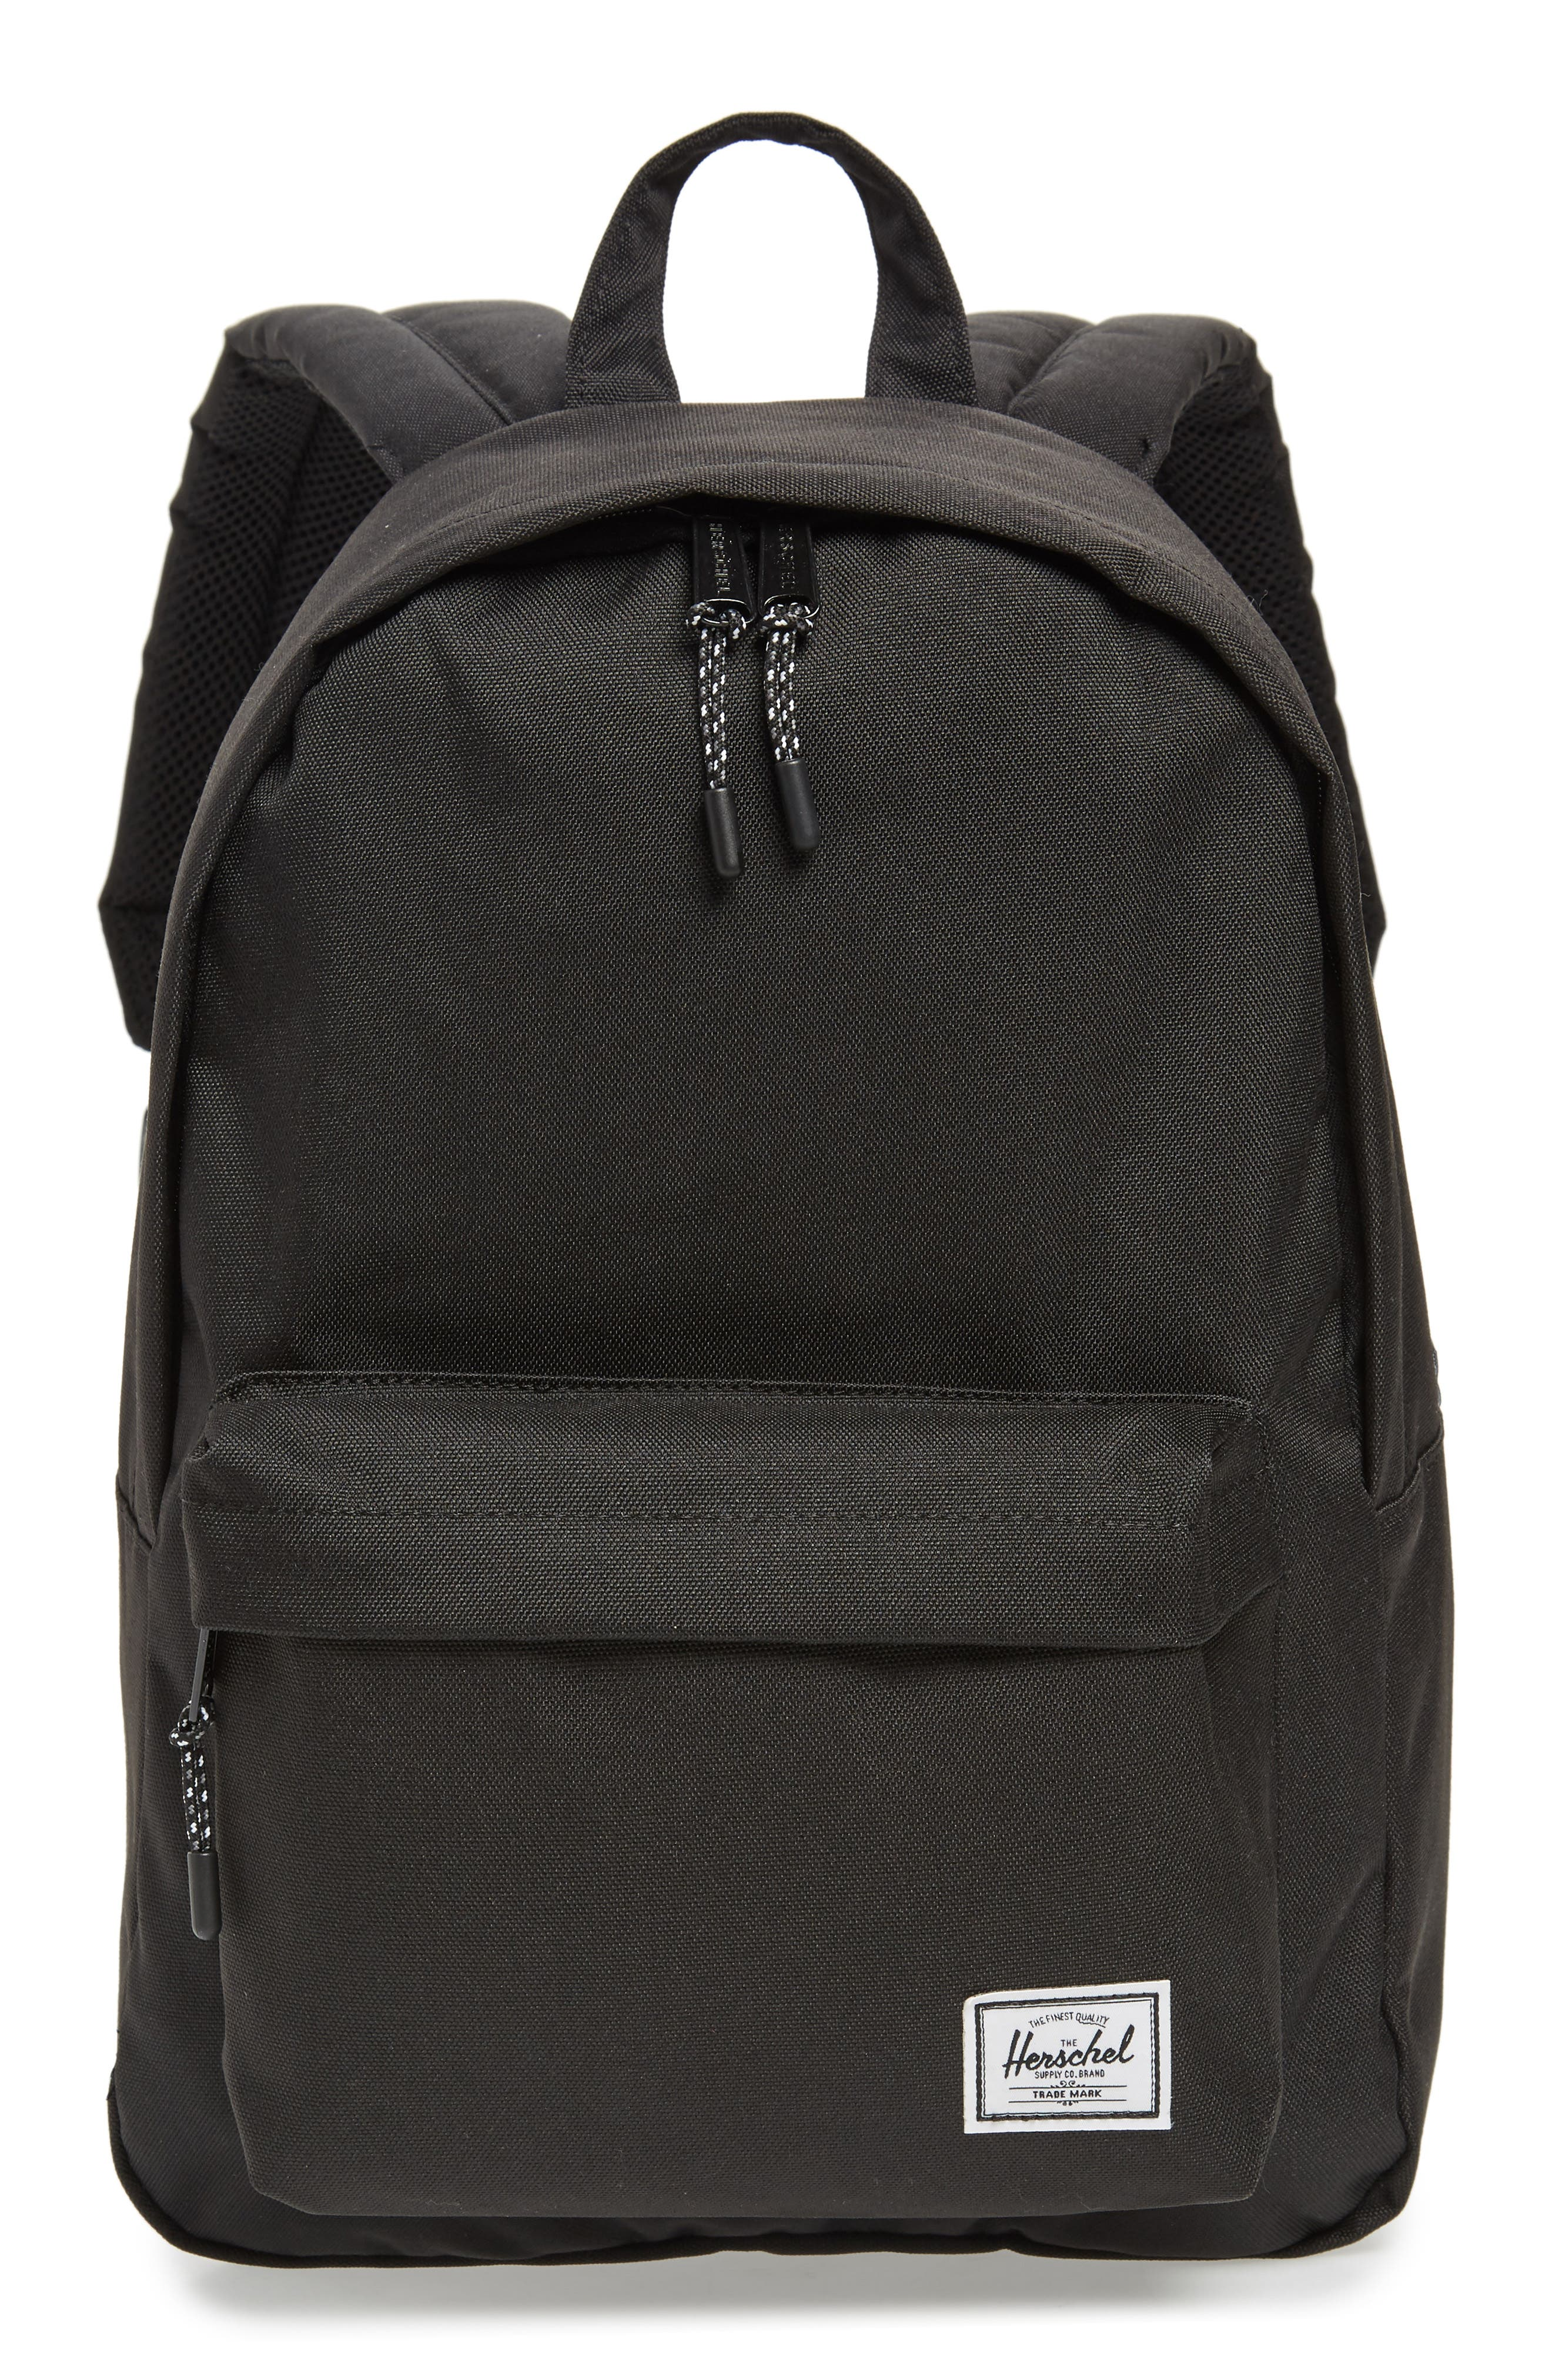 Herschel Supply Co. Classic Mid Volume Backpack - Black